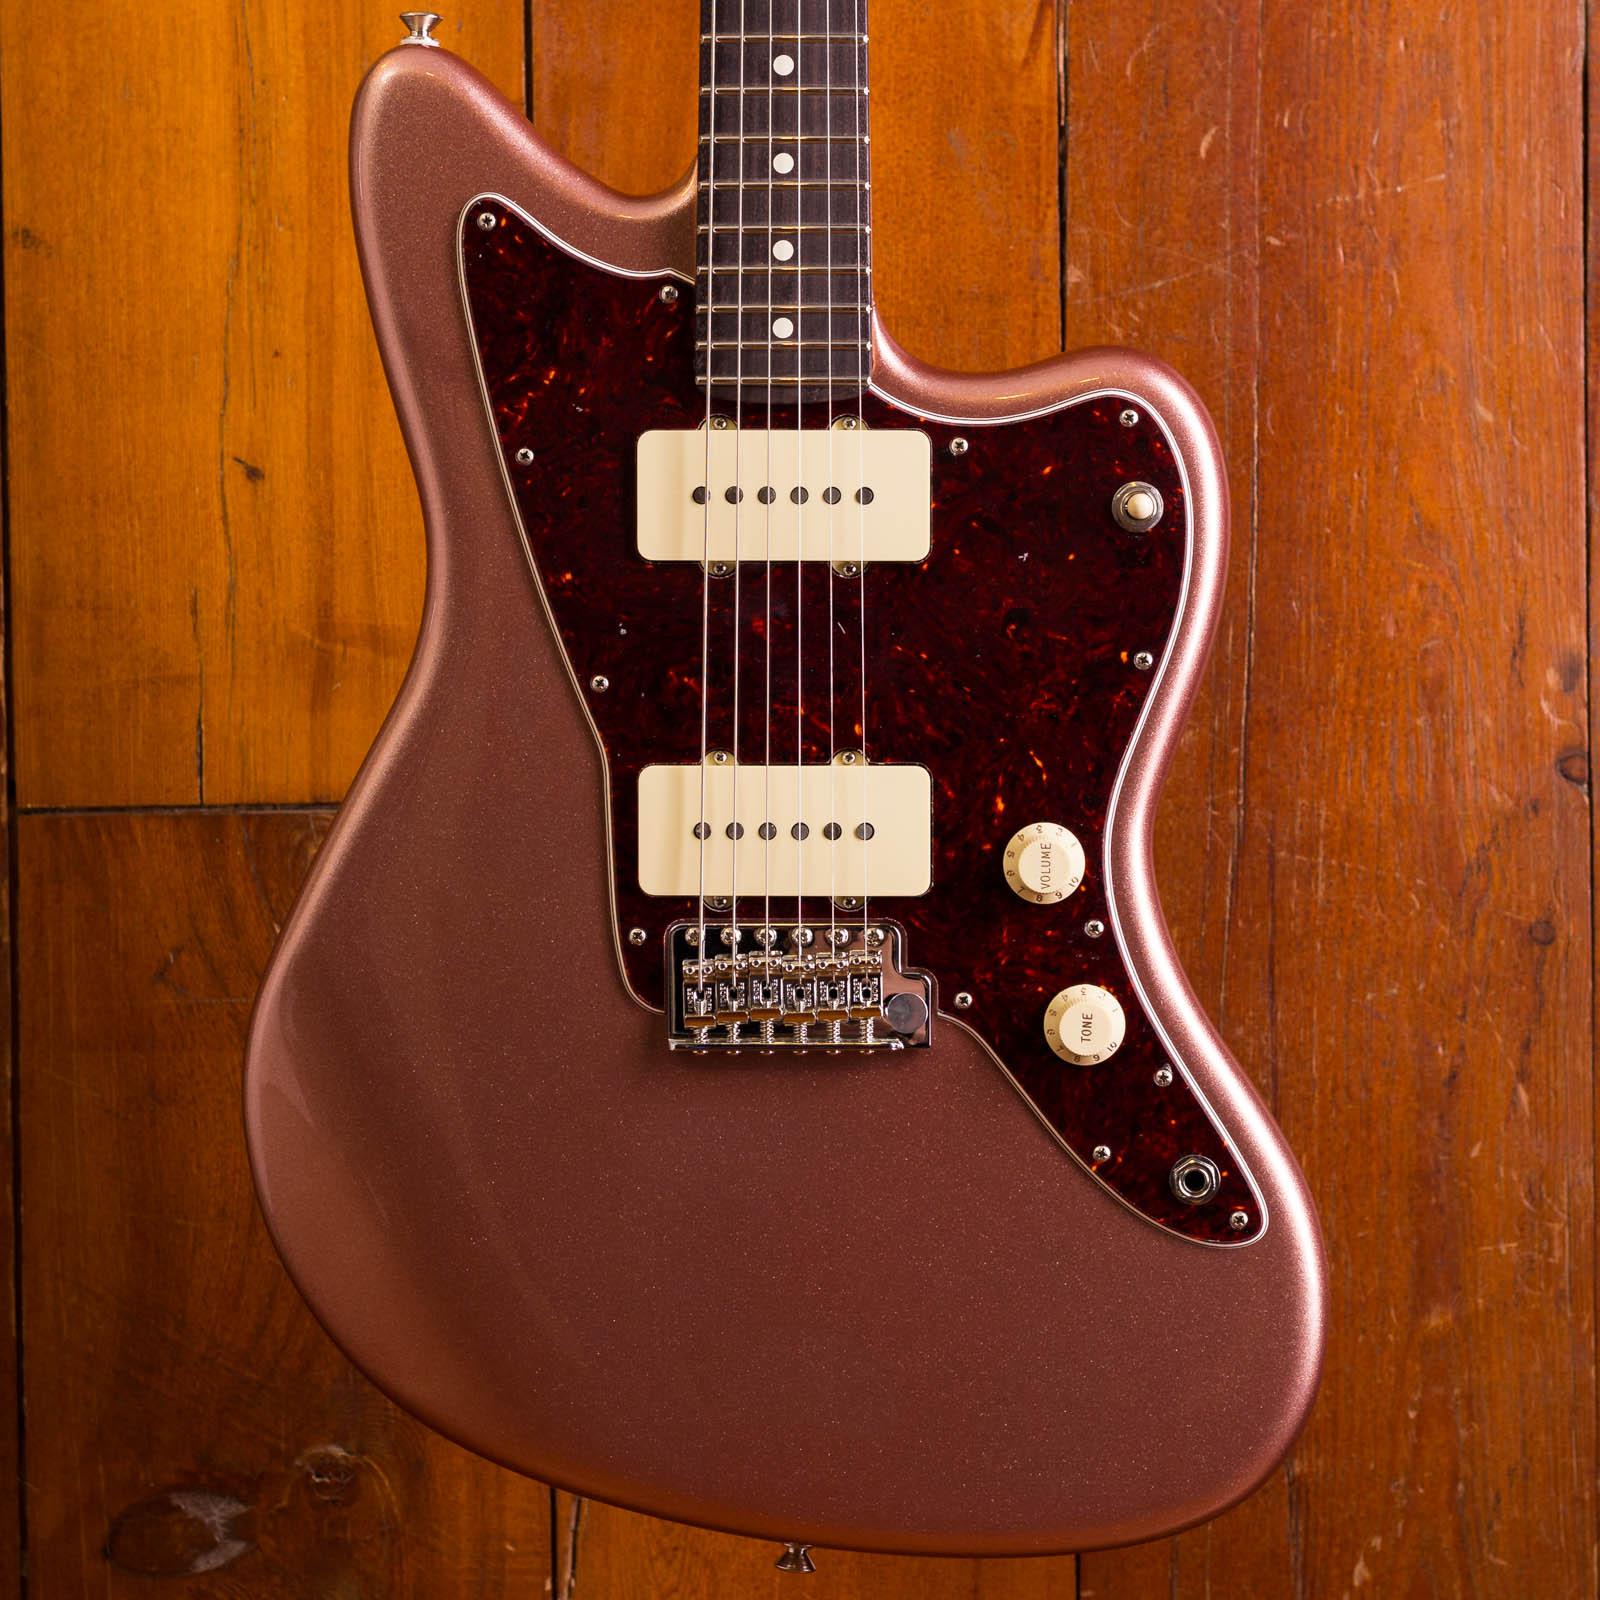 Fender American Performer Jazzmaster Penny